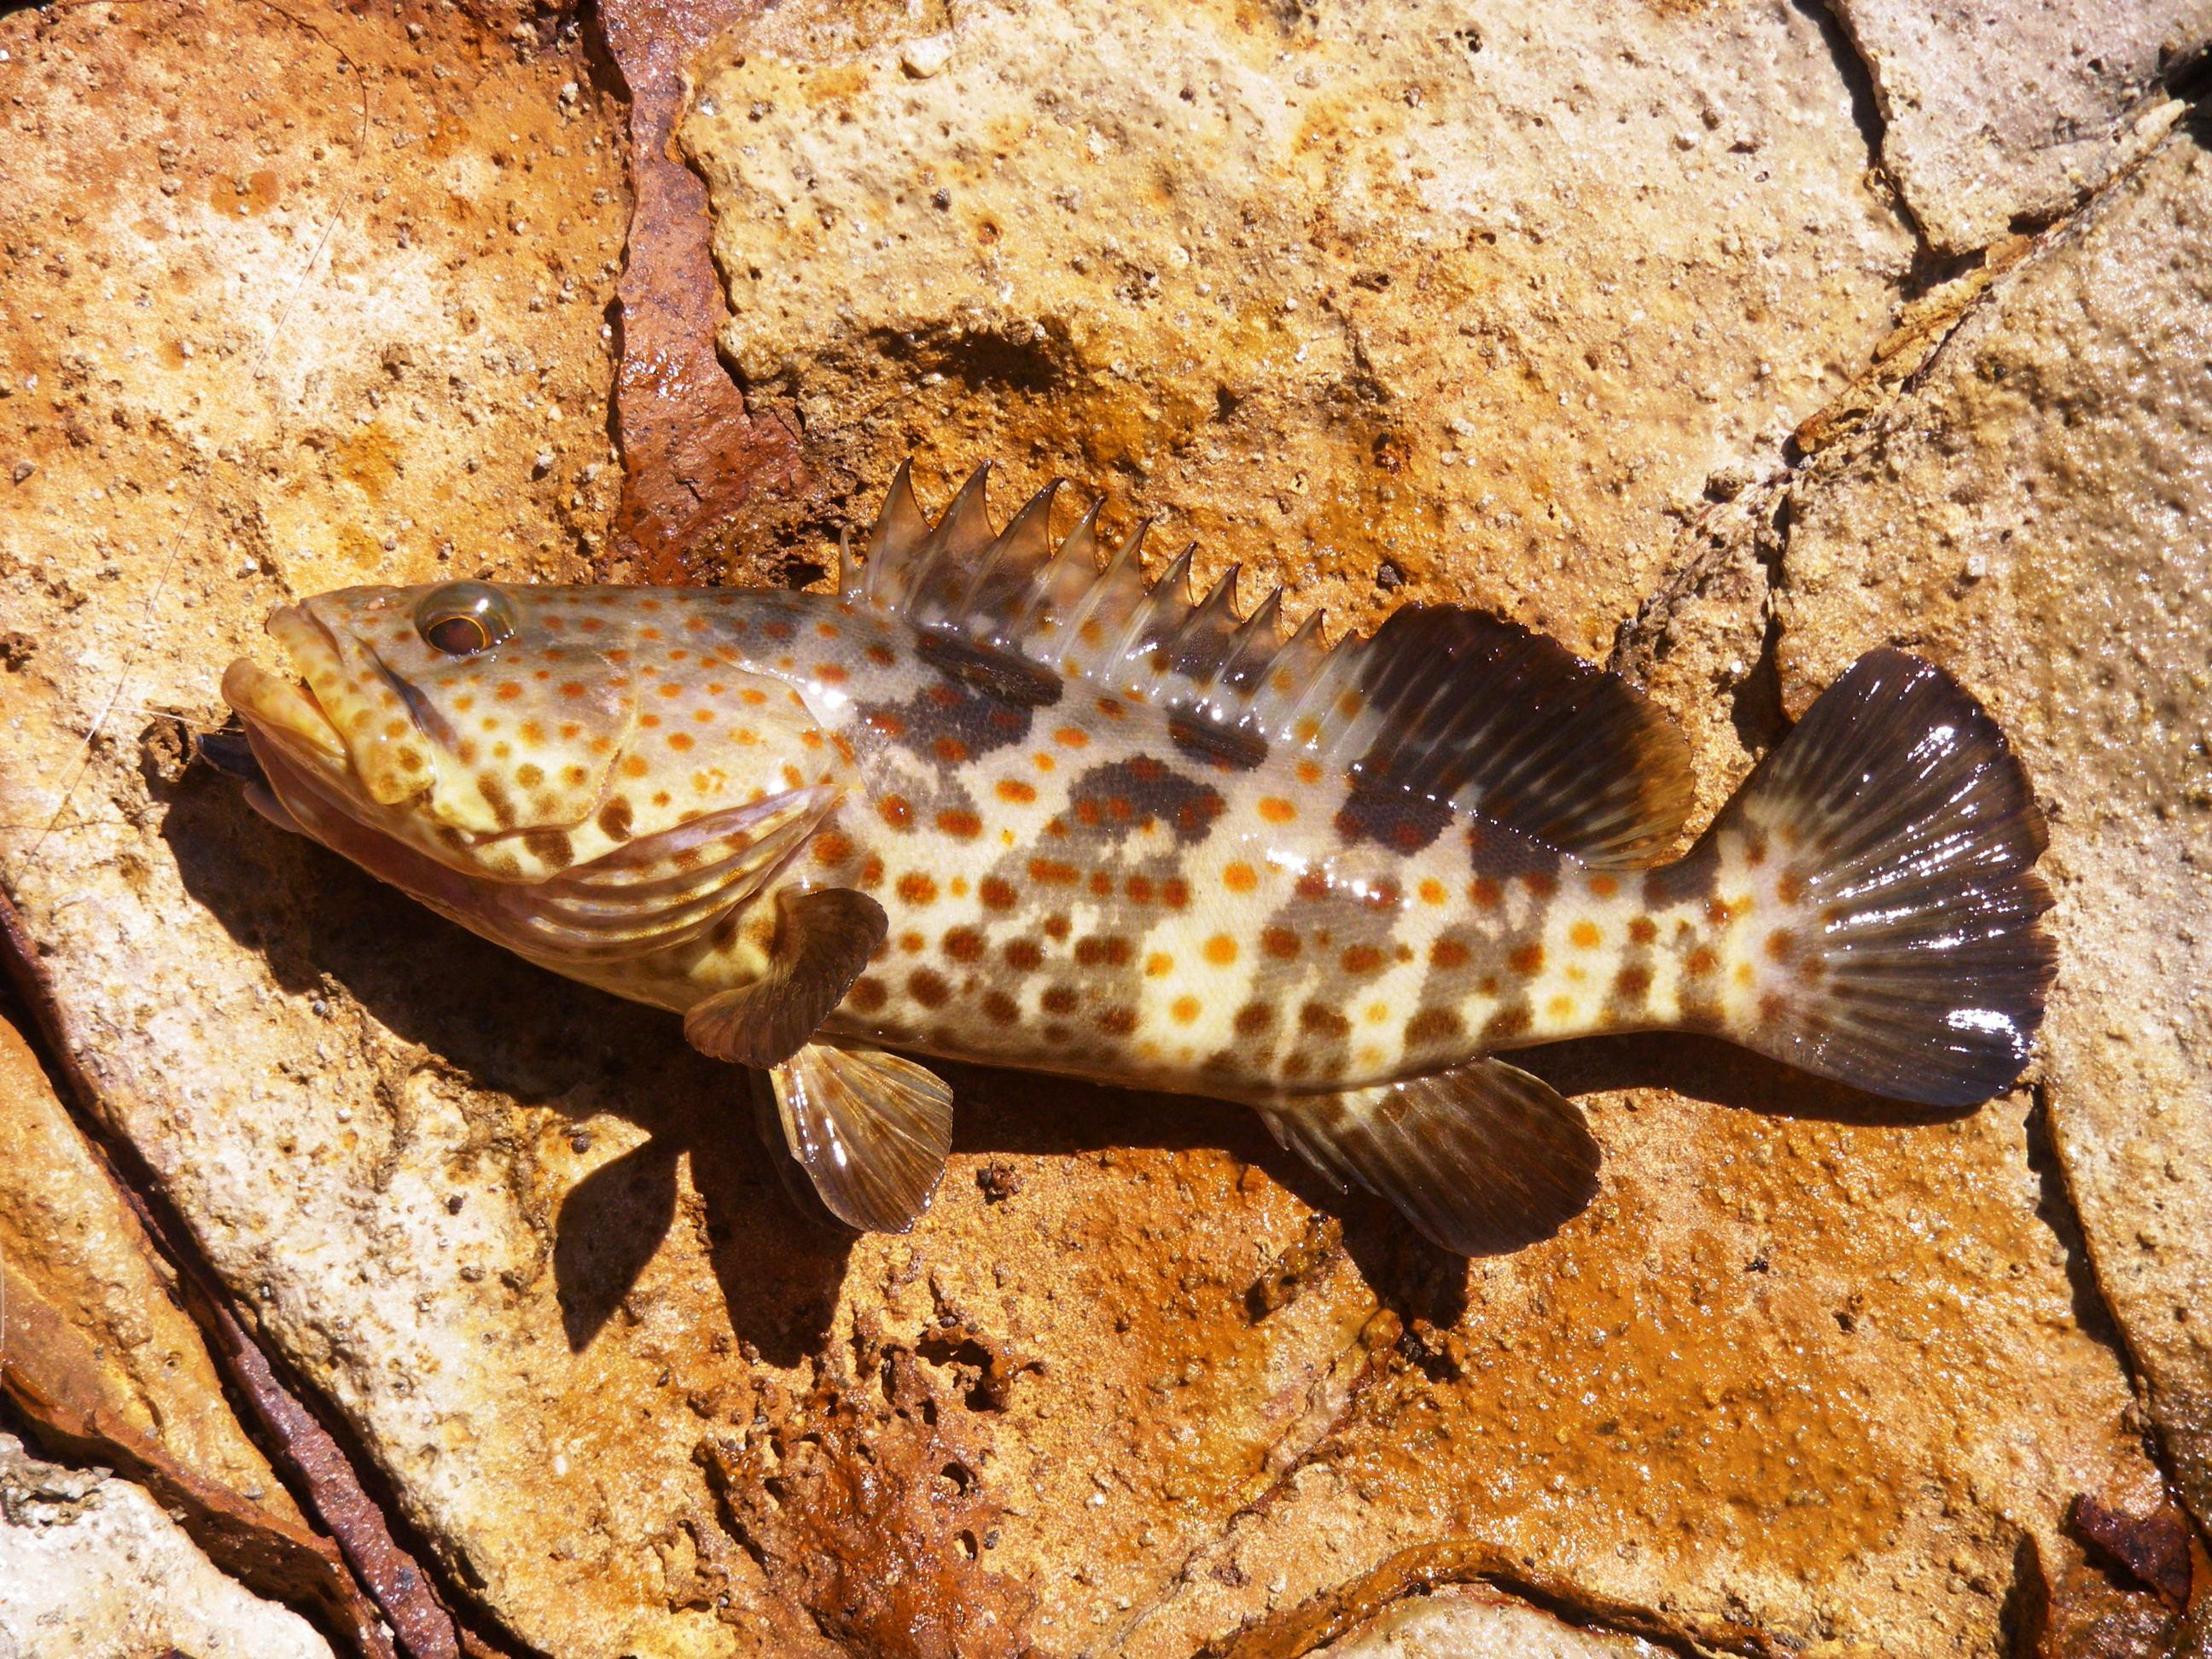 Bluff rock cod the biggest so far landangler 39 s blog for Rock cod fish